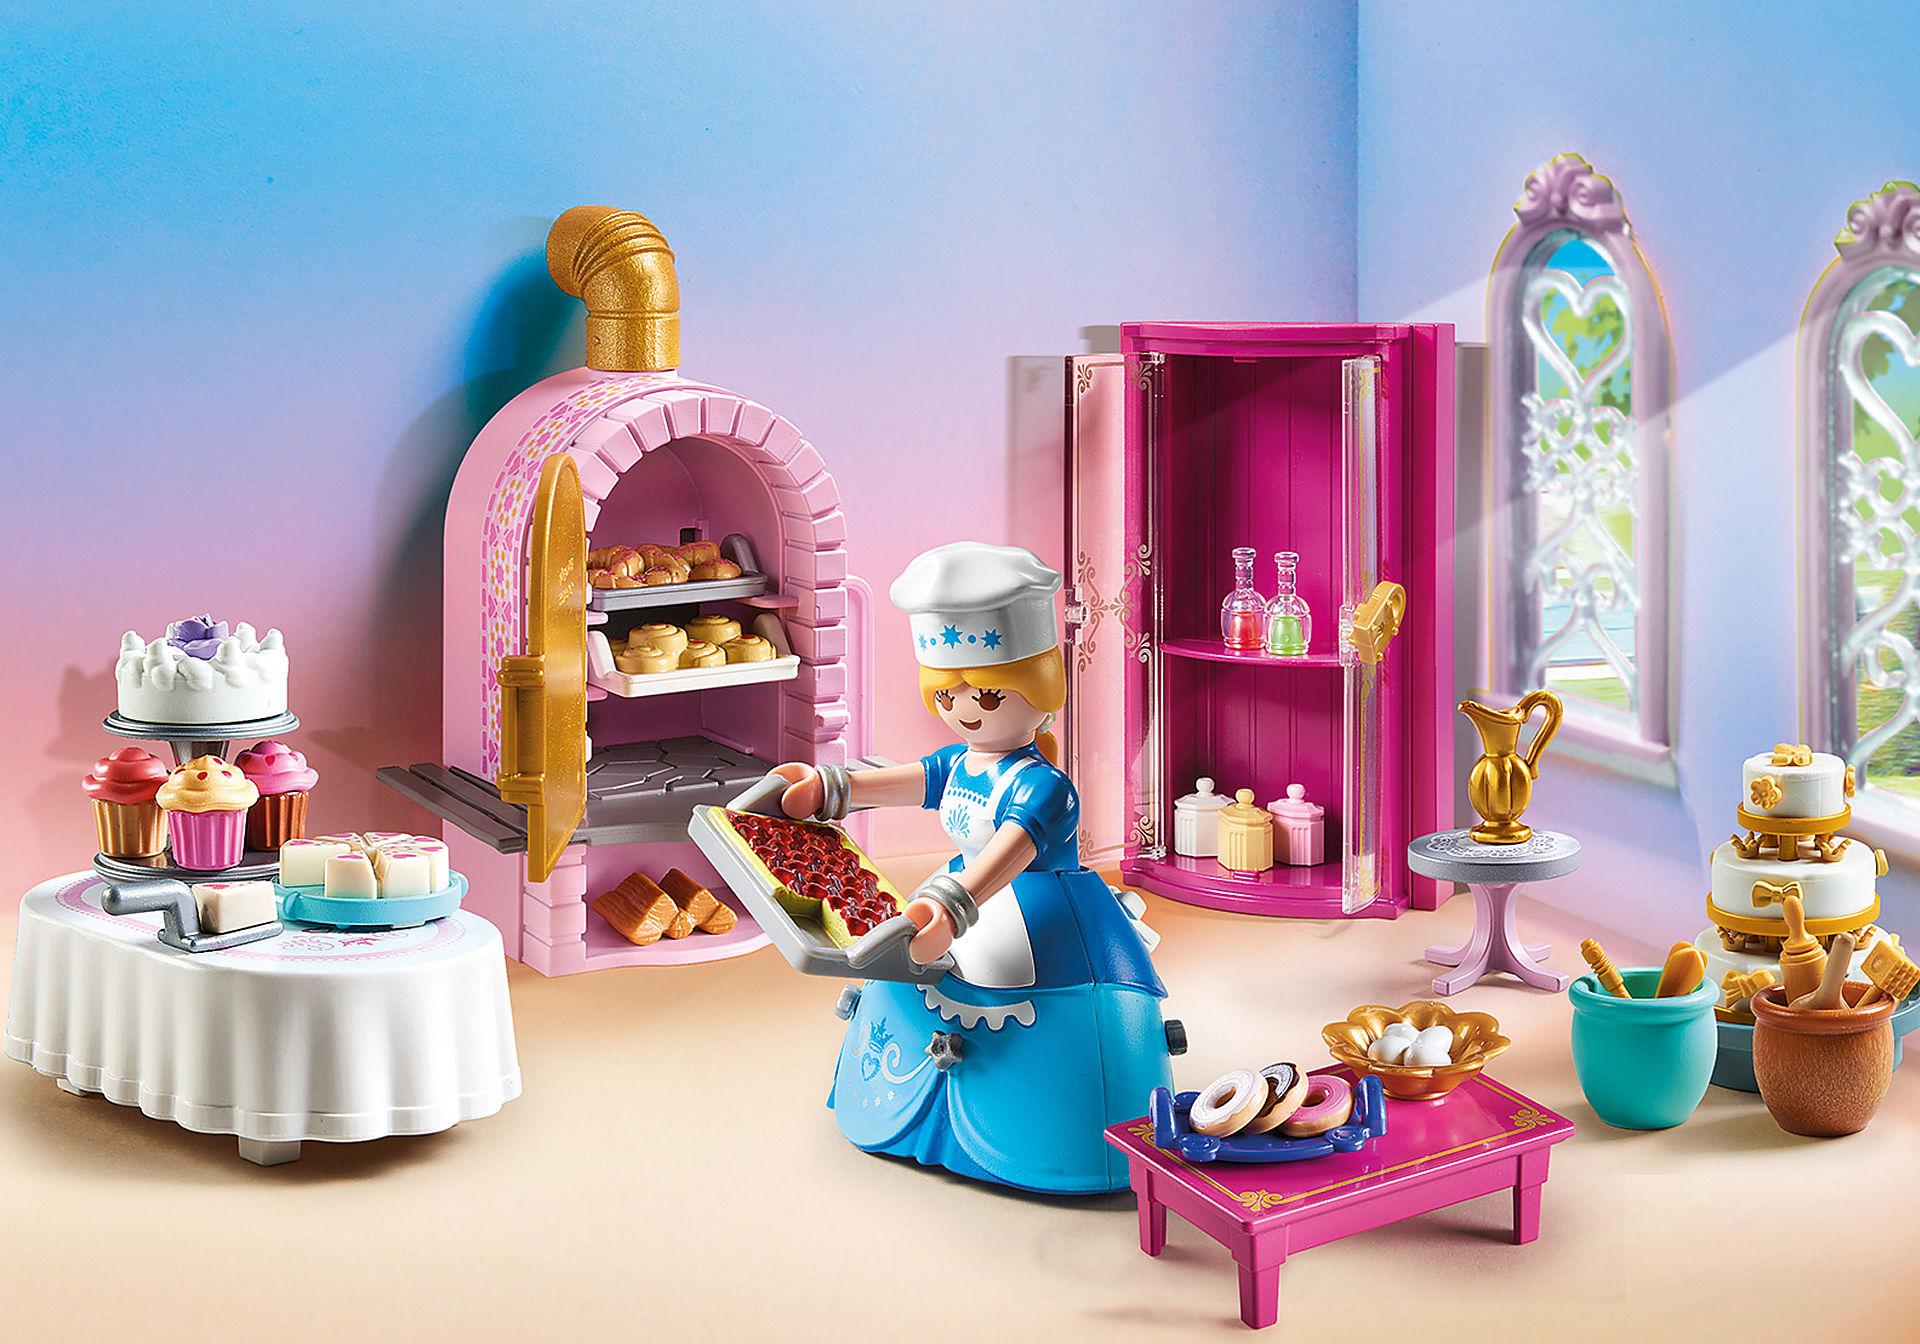 70451 Castle Bakery zoom image1